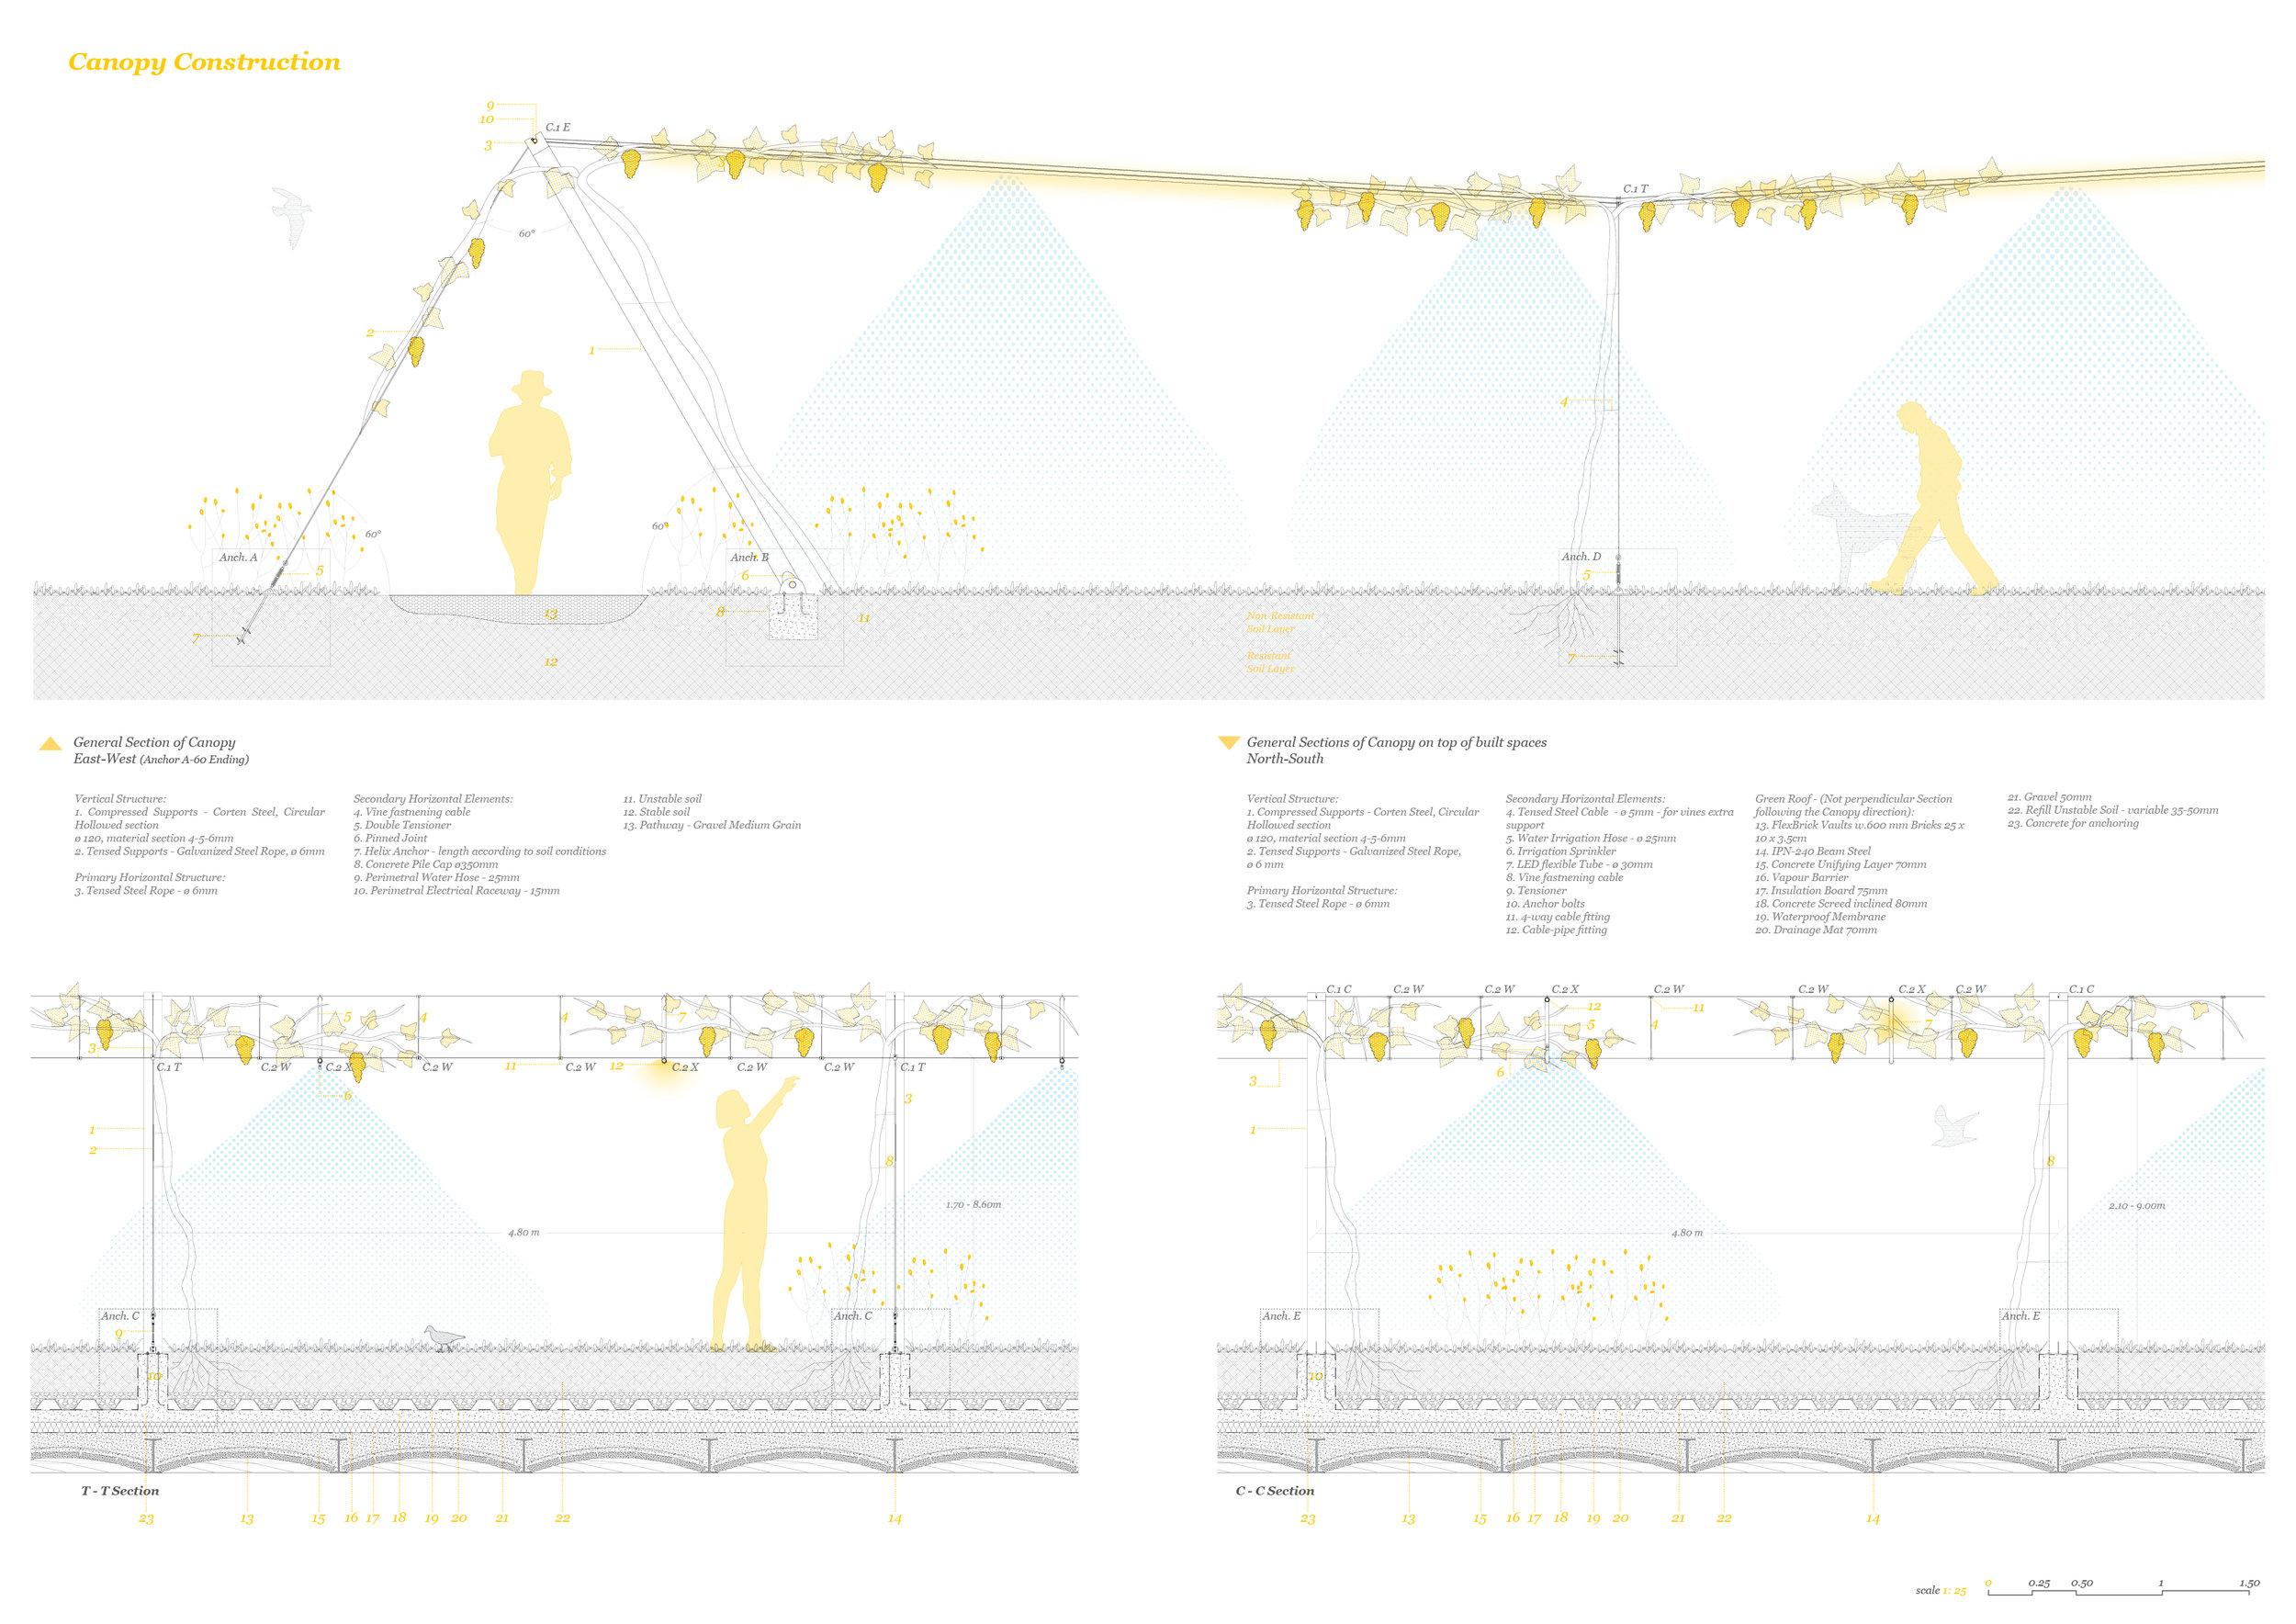 11_LL_Canopy-Construction.jpg